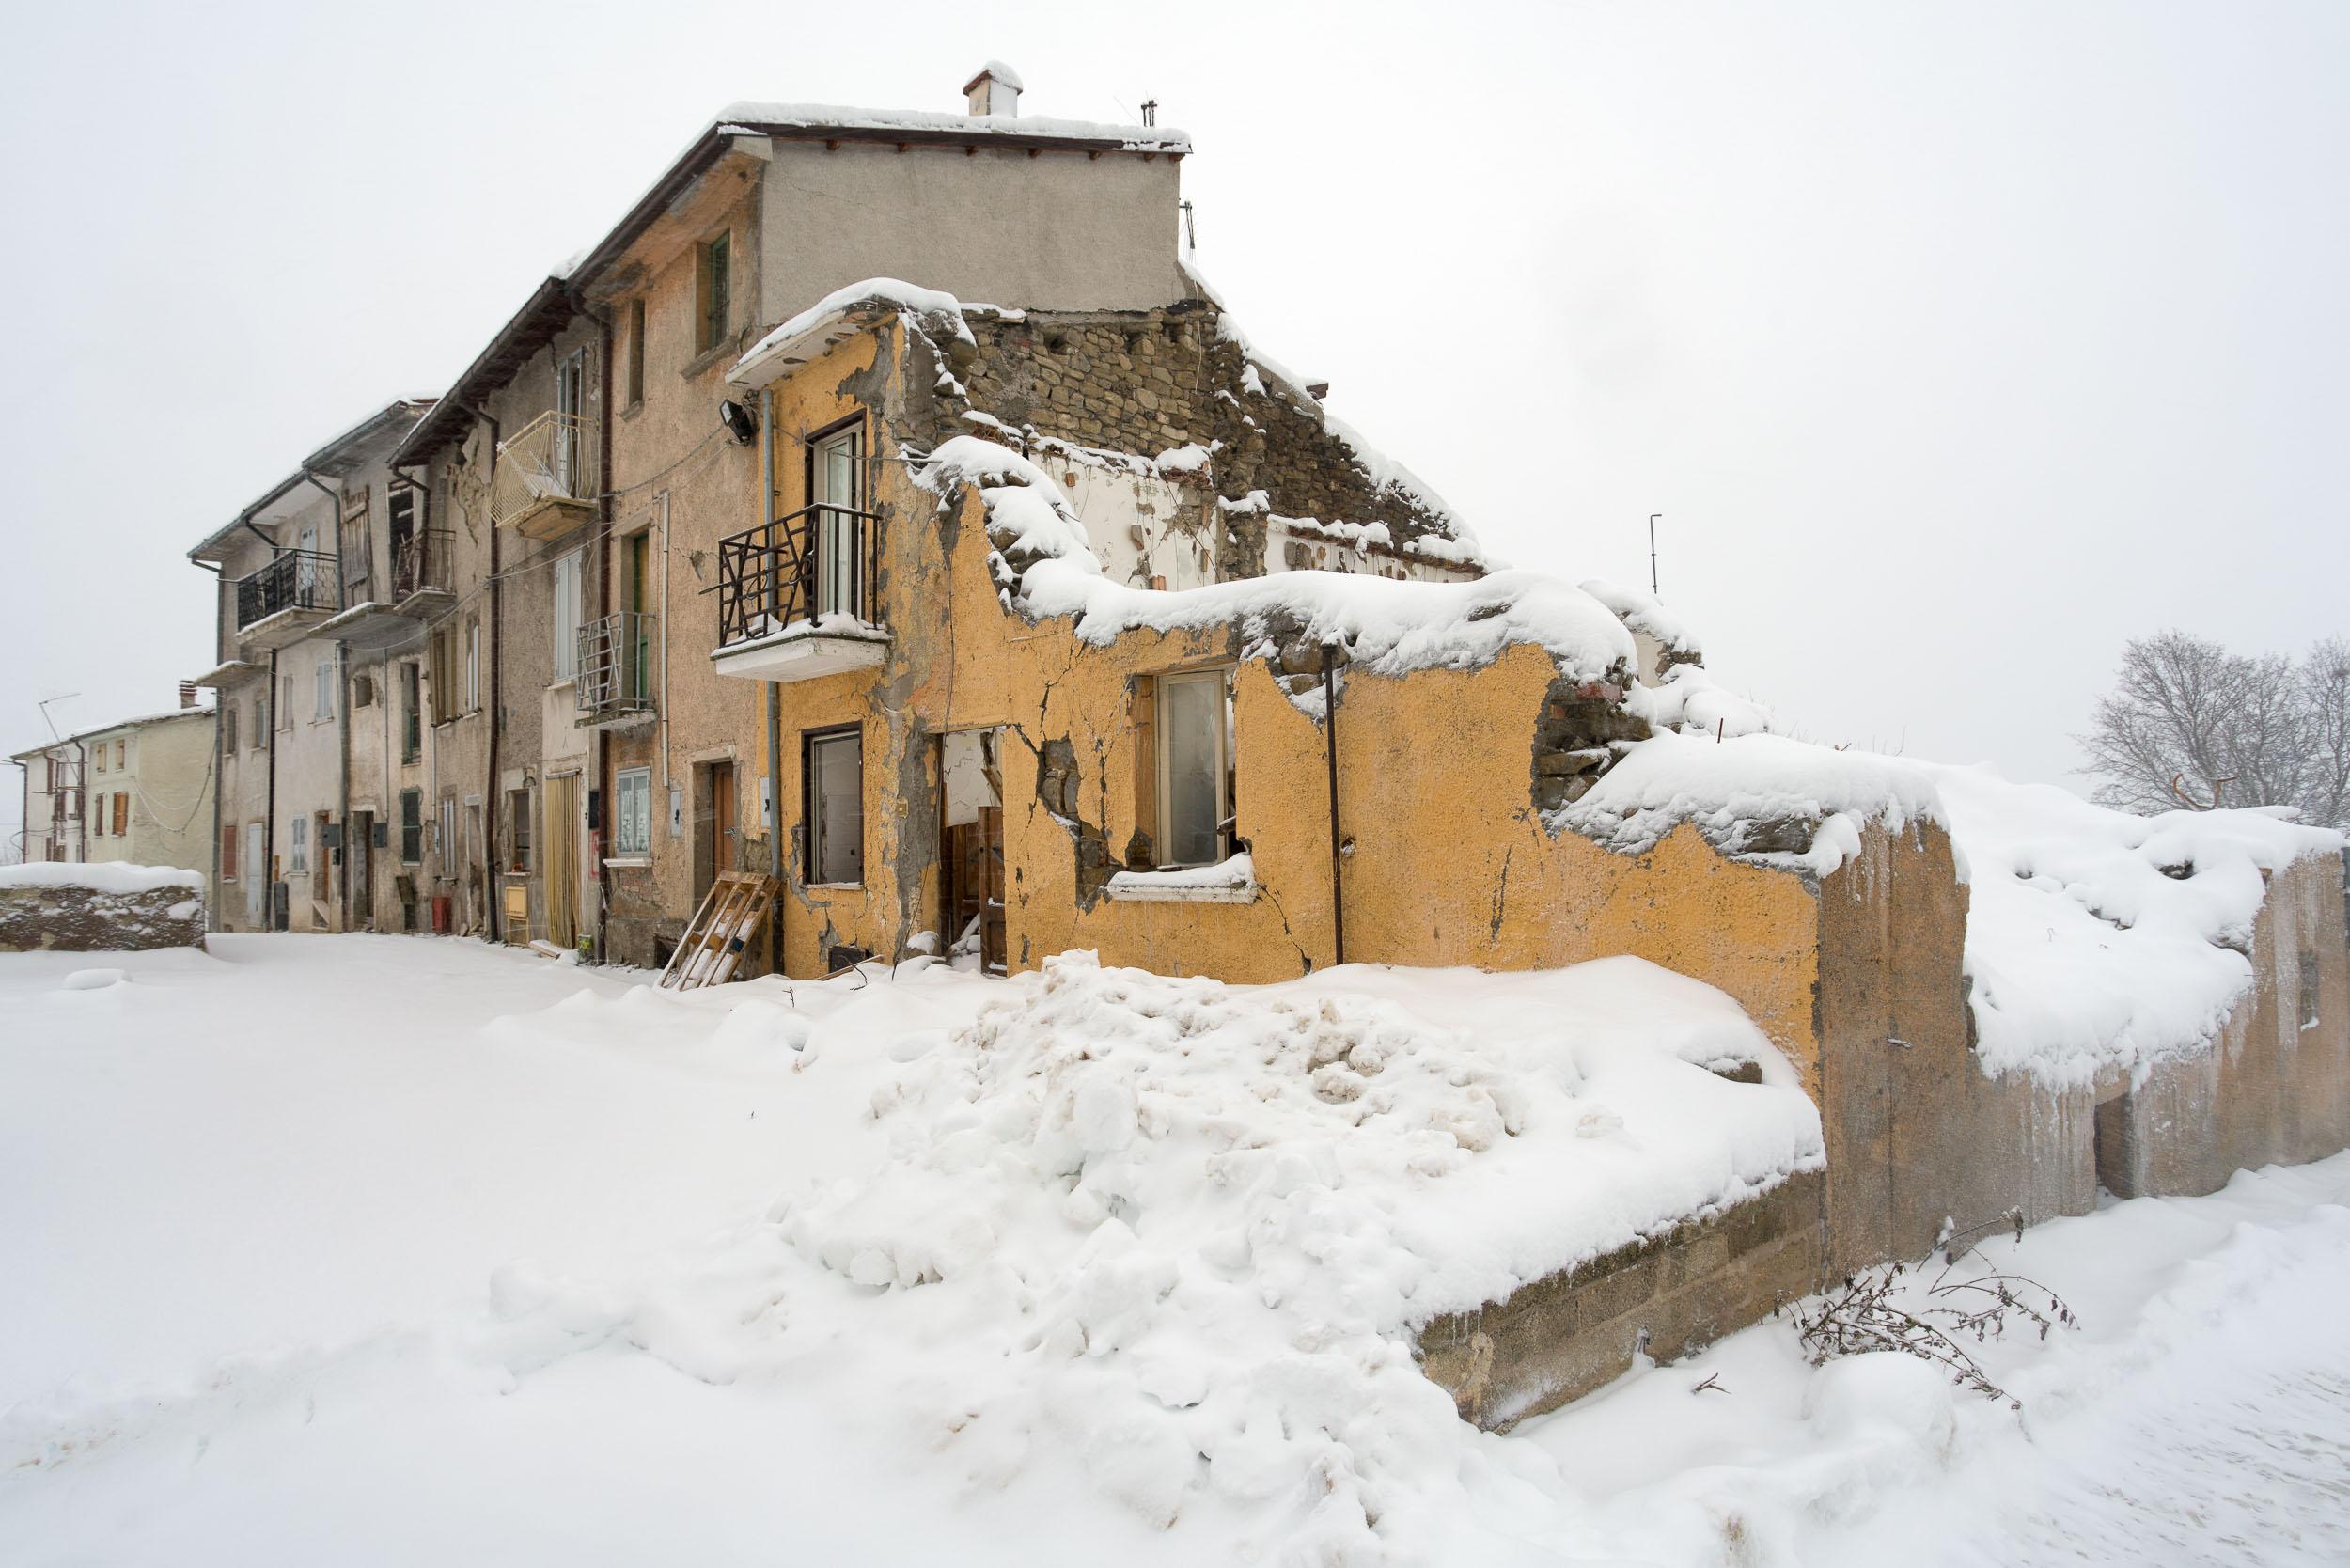 008-Campotosto_GAB3214M-Gabriele Lungarella.jpg